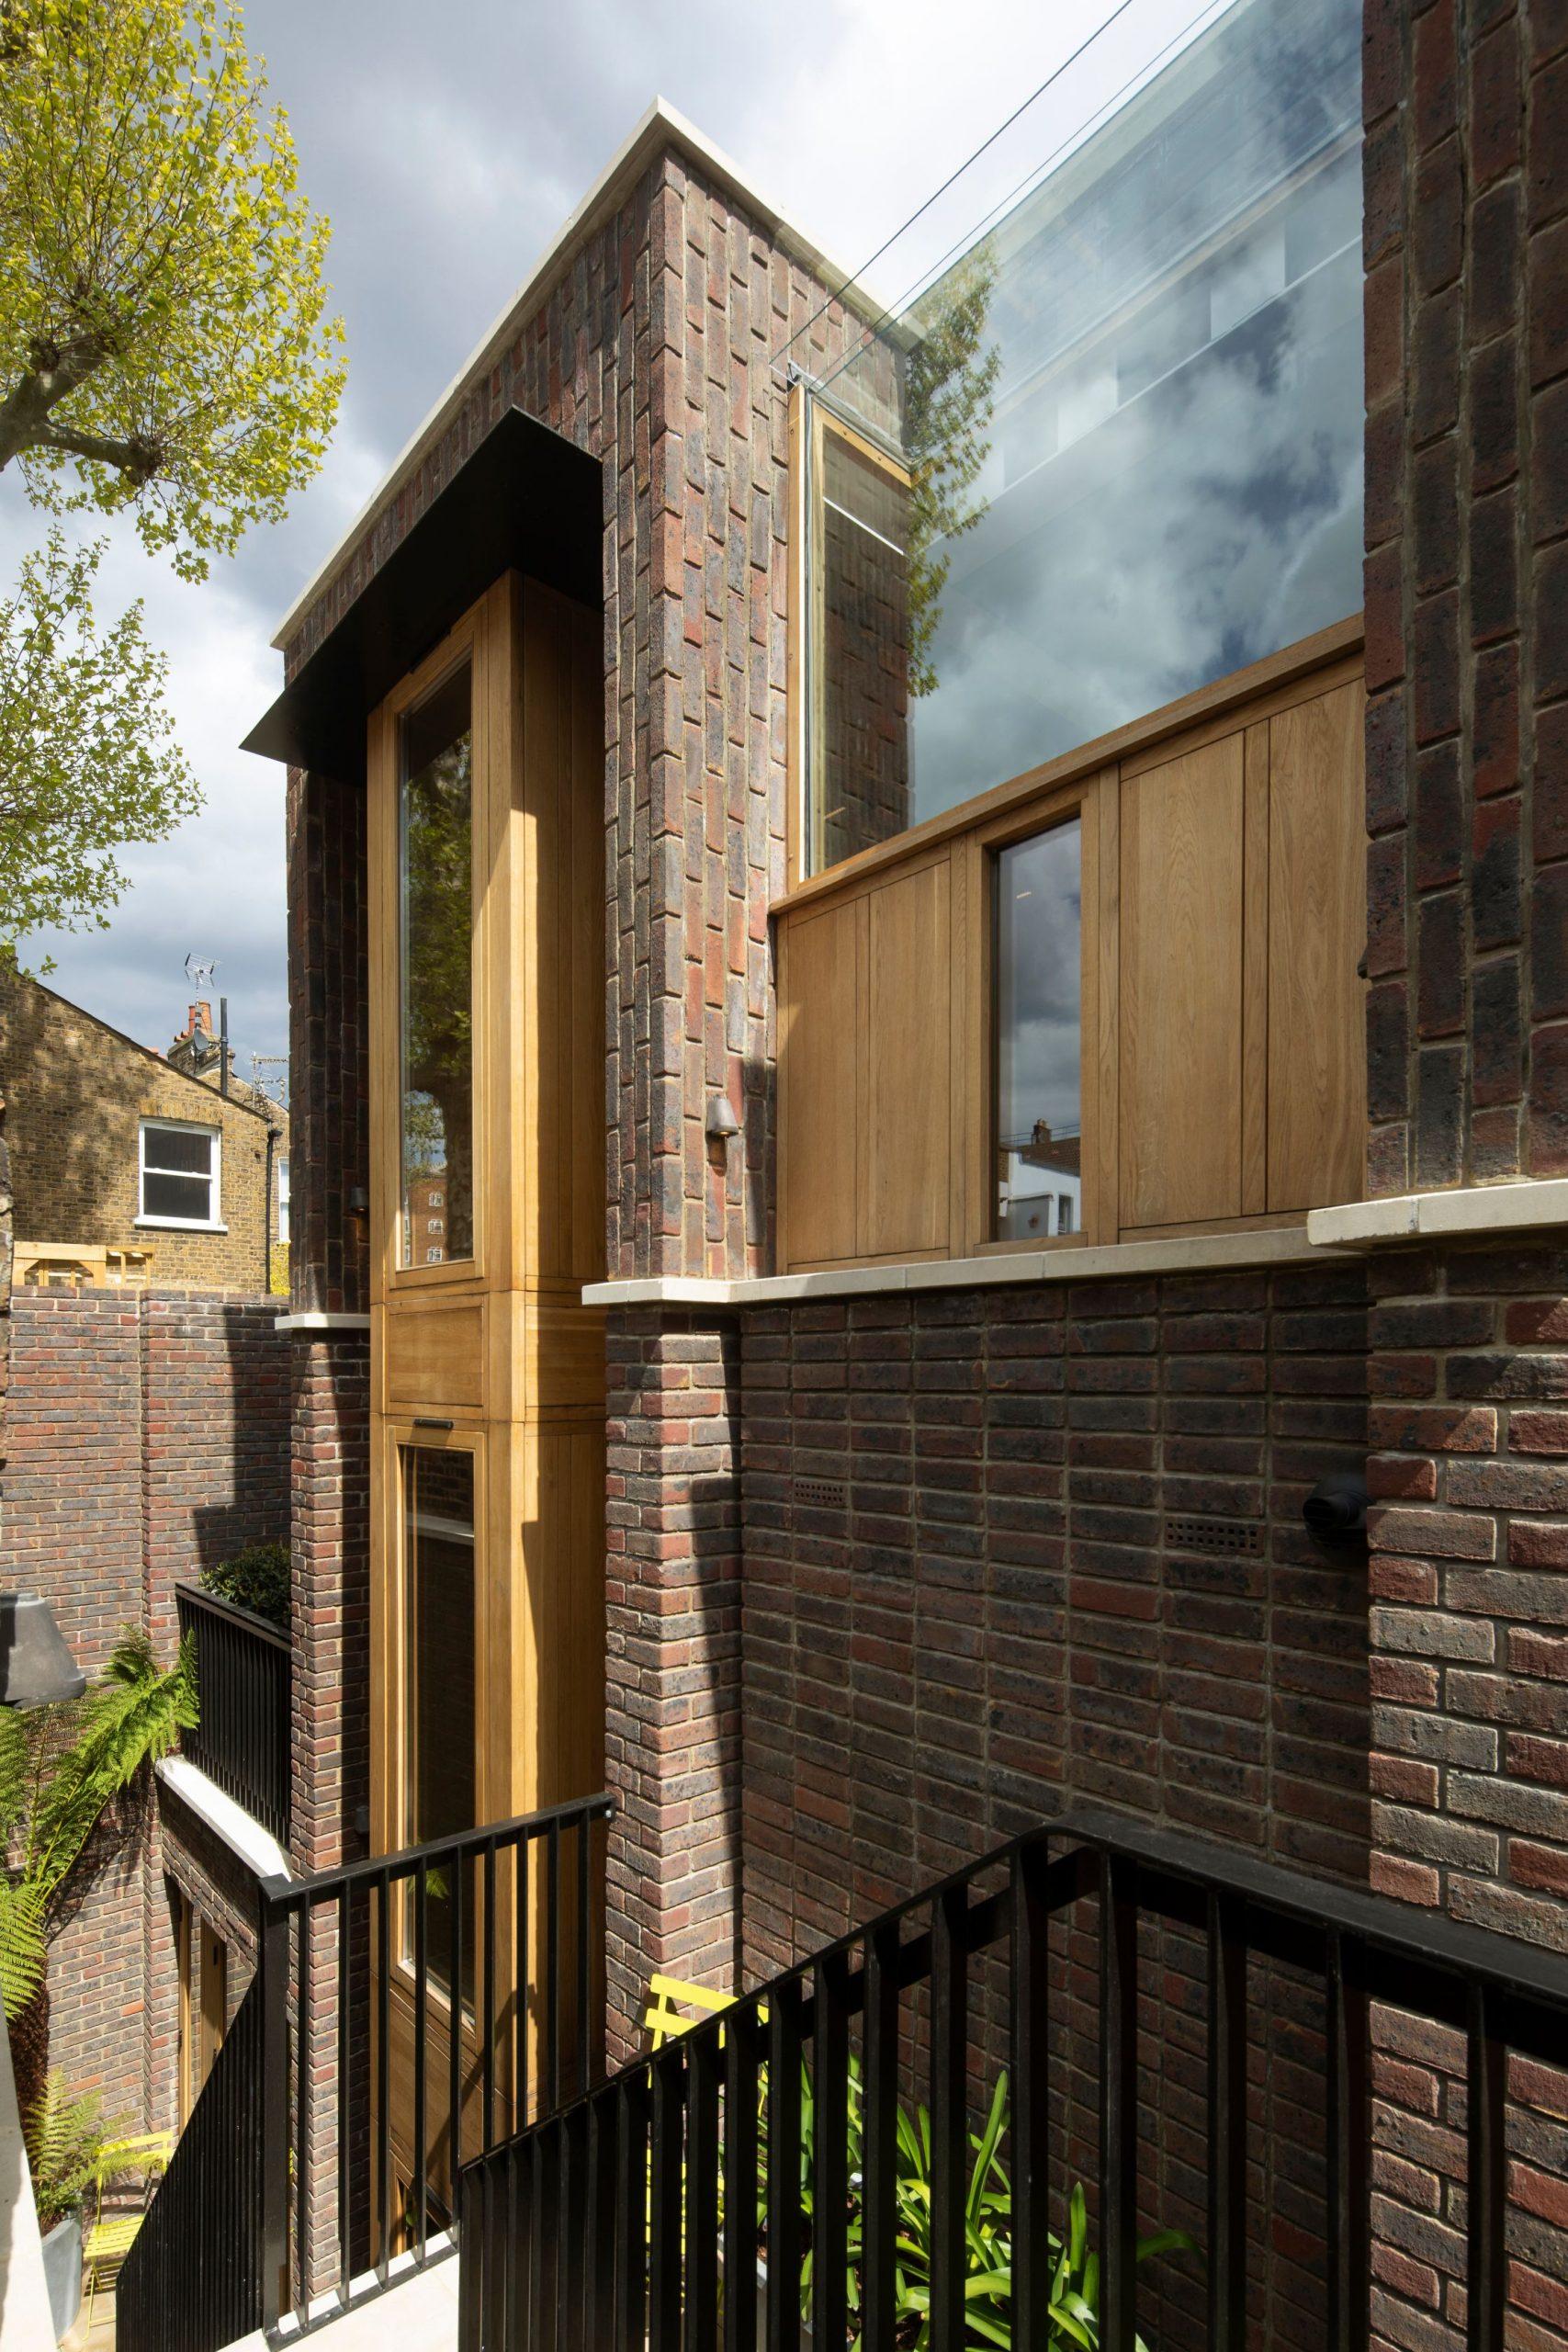 Brick_house11